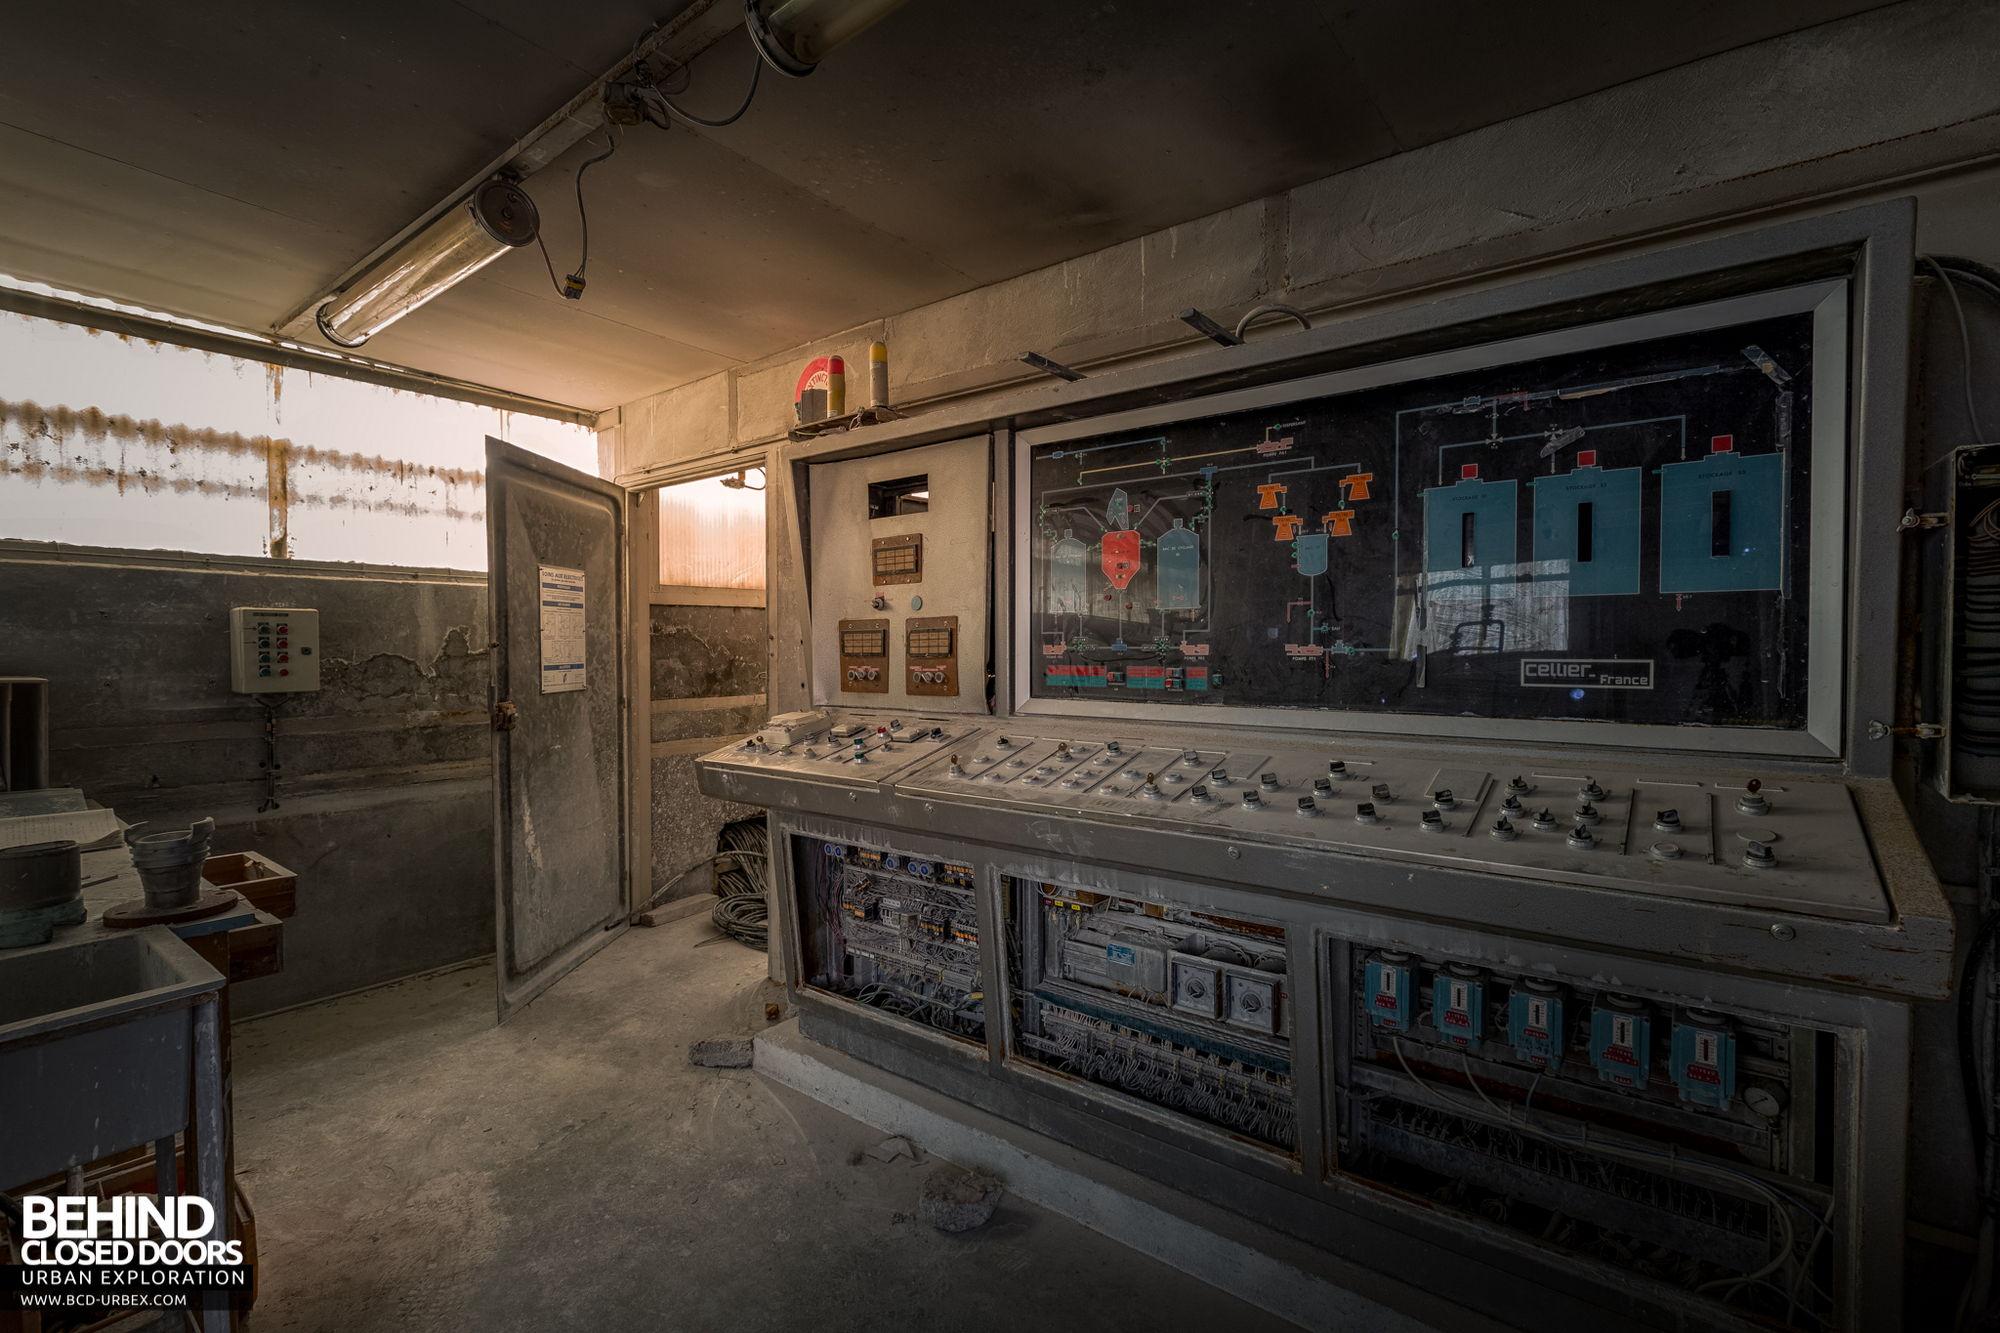 Stora Enso, Corbehem - Small control room